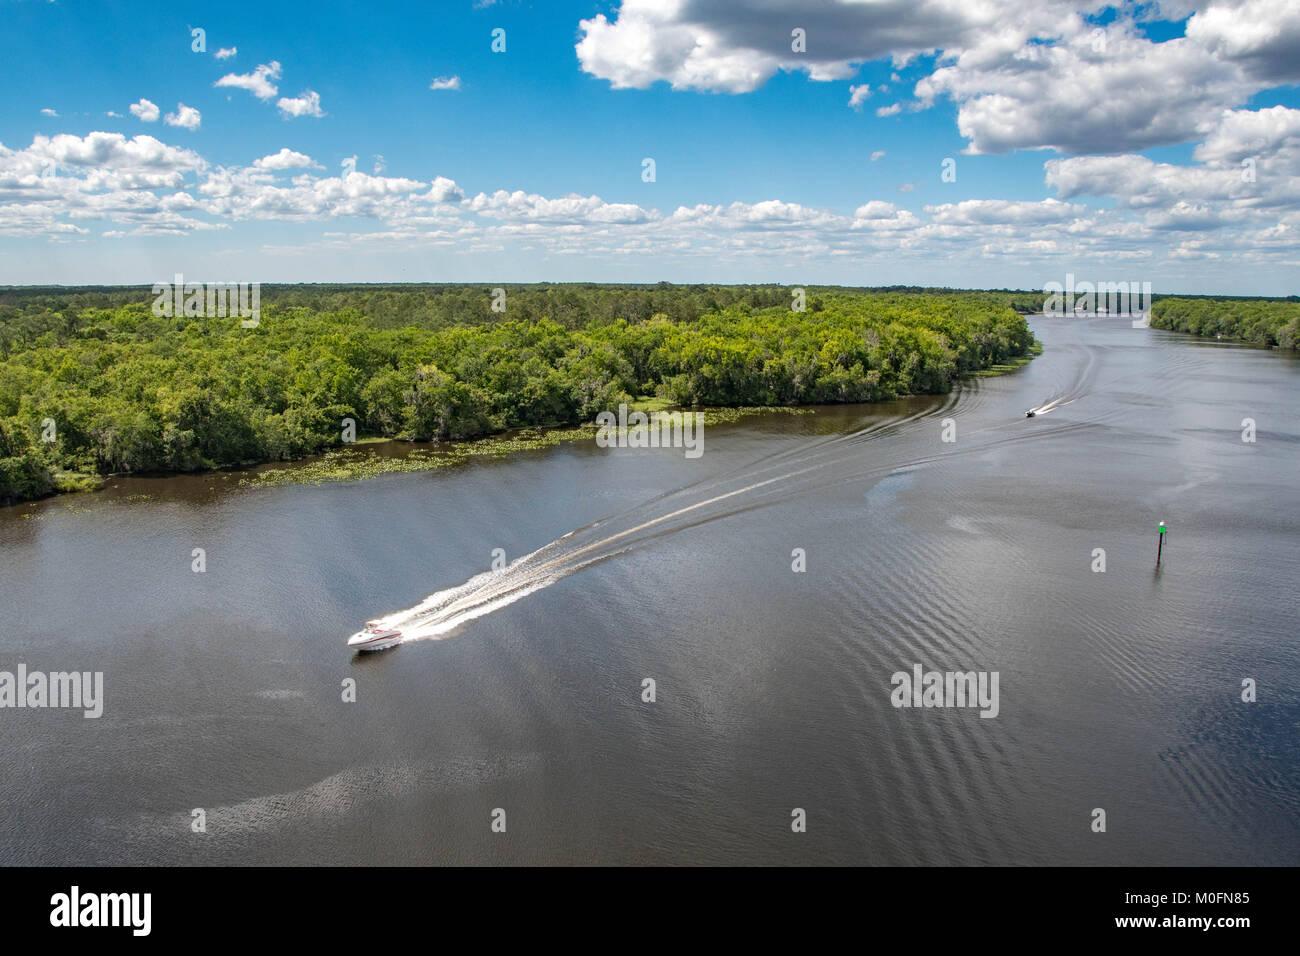 Boats swiftly glide across river in marshlands of Florida coastline - Stock Image